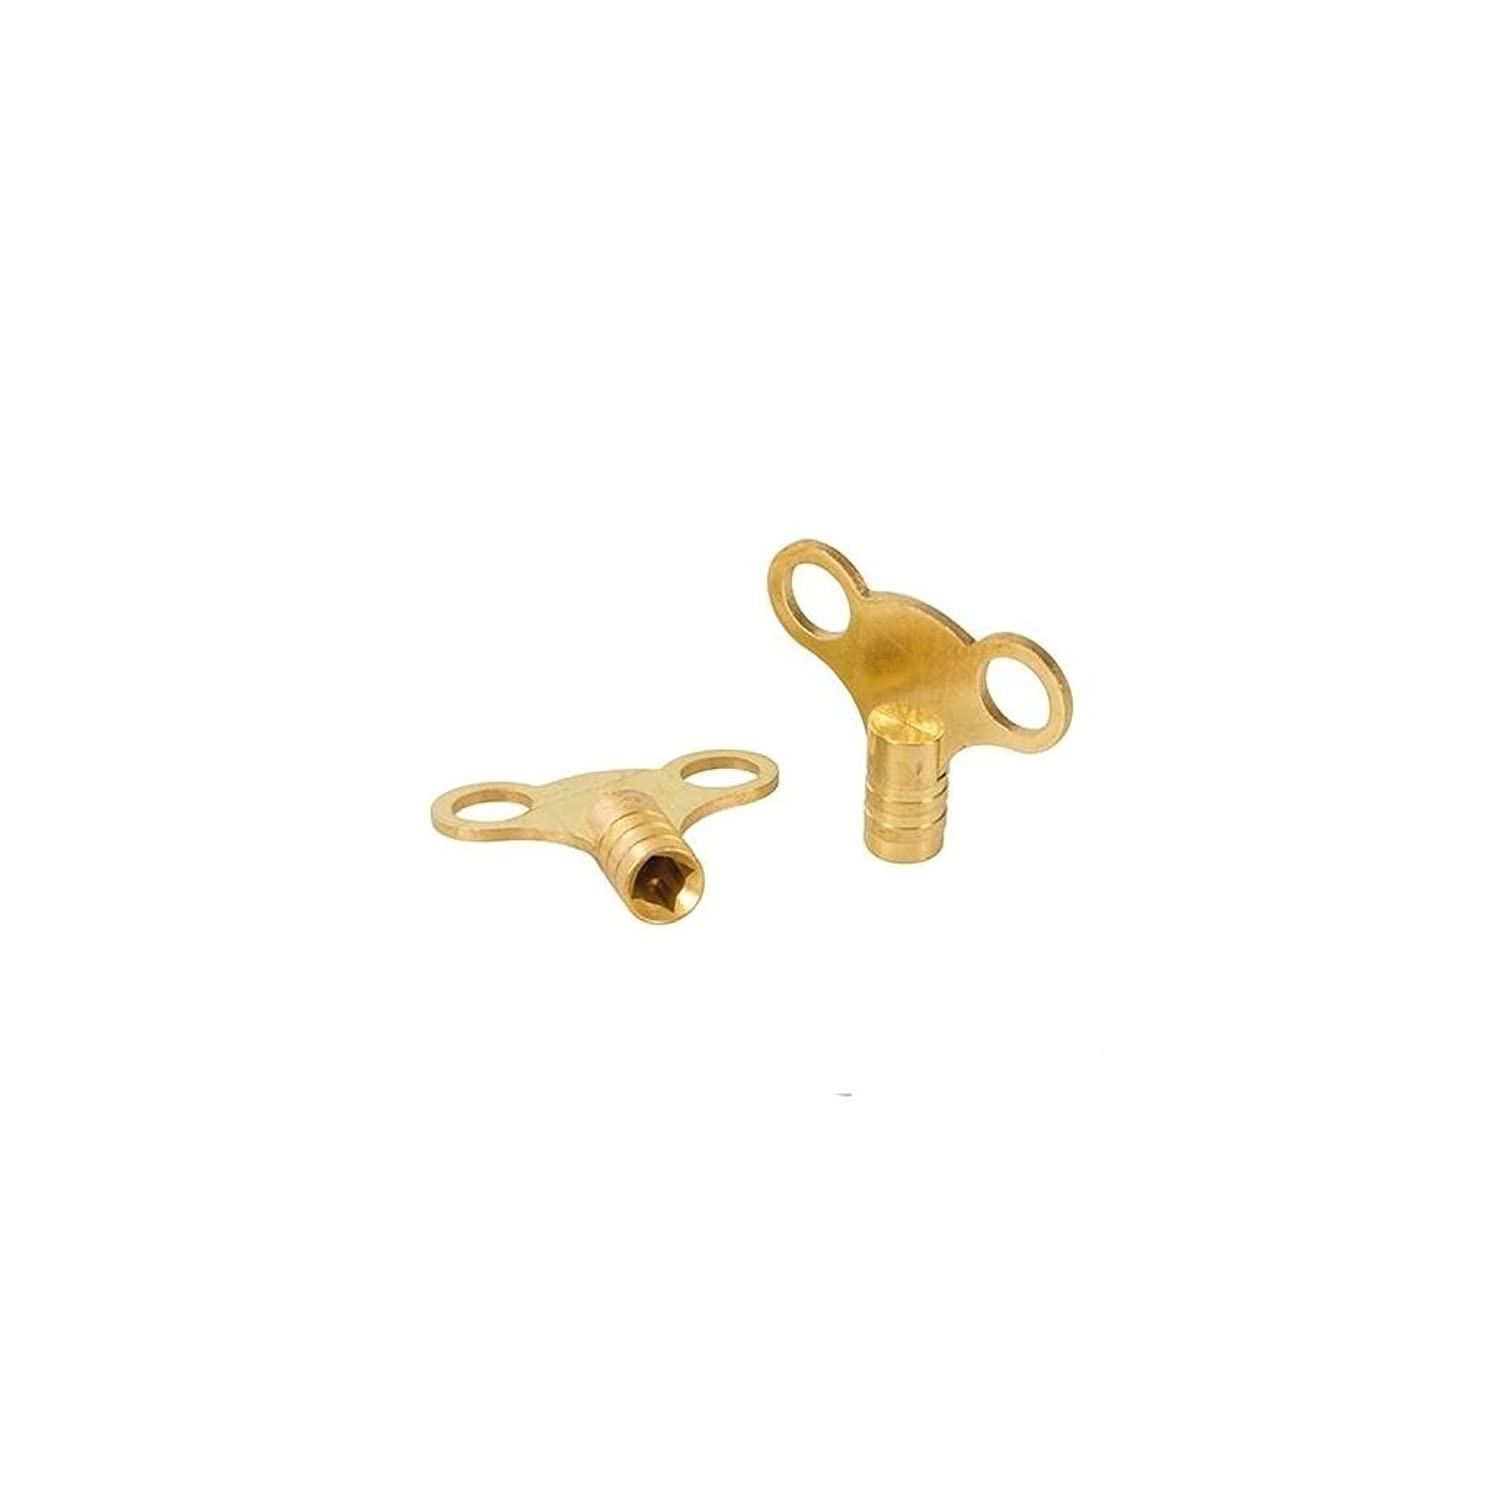 Dickie Dyer 476883 11.016 Brass Clock-Type Radiator Bleed Keys, Black, Set of 2 Pieces